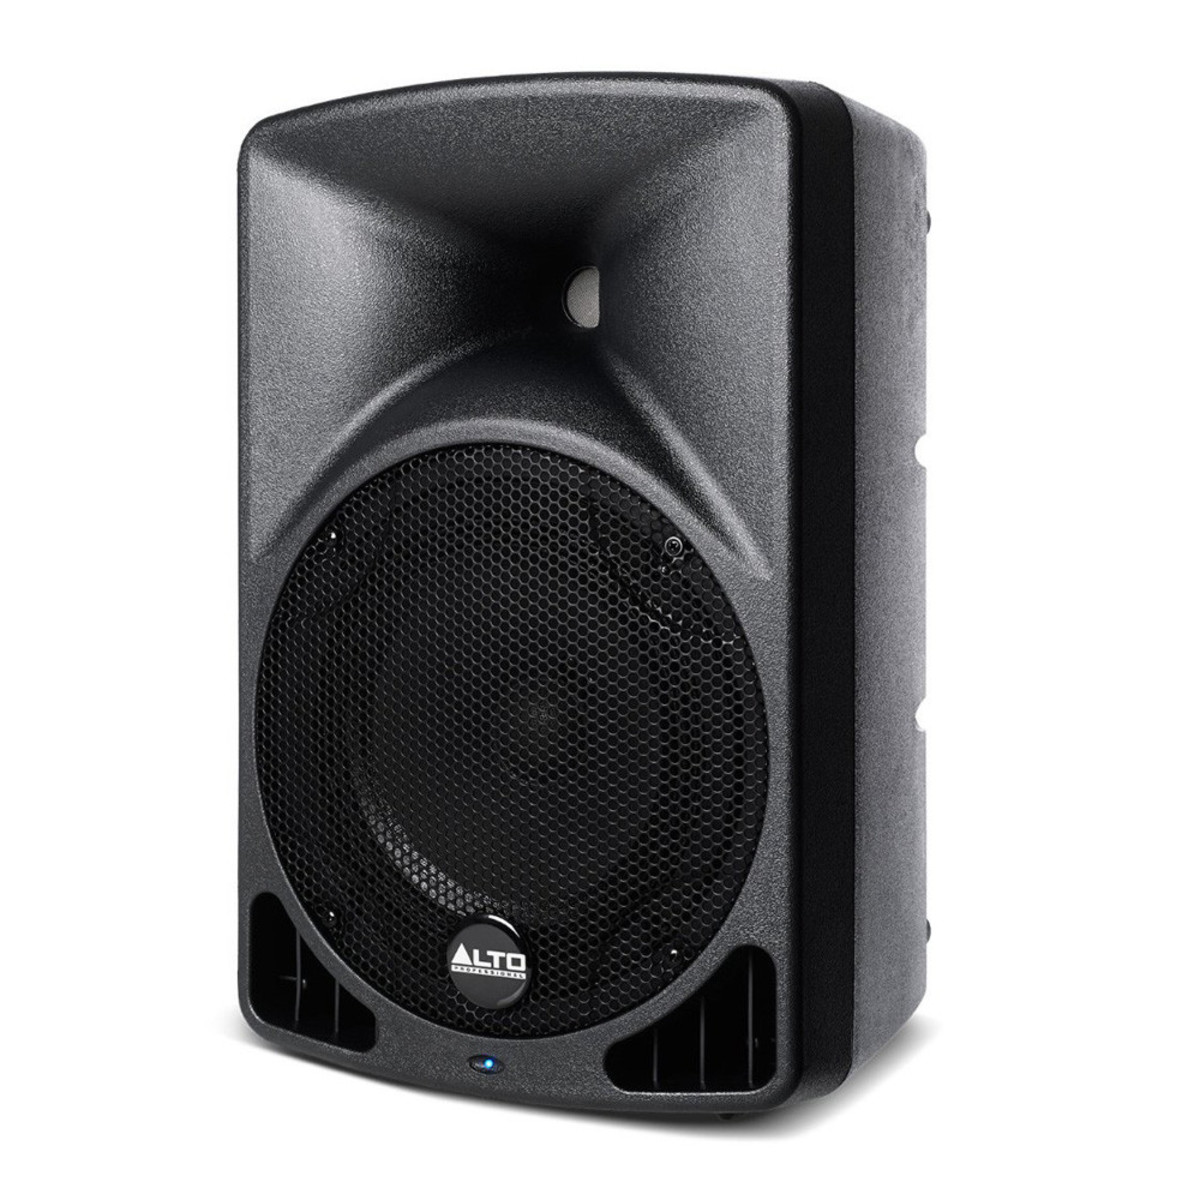 Image of Alto TX8 Active PA Loudspeaker